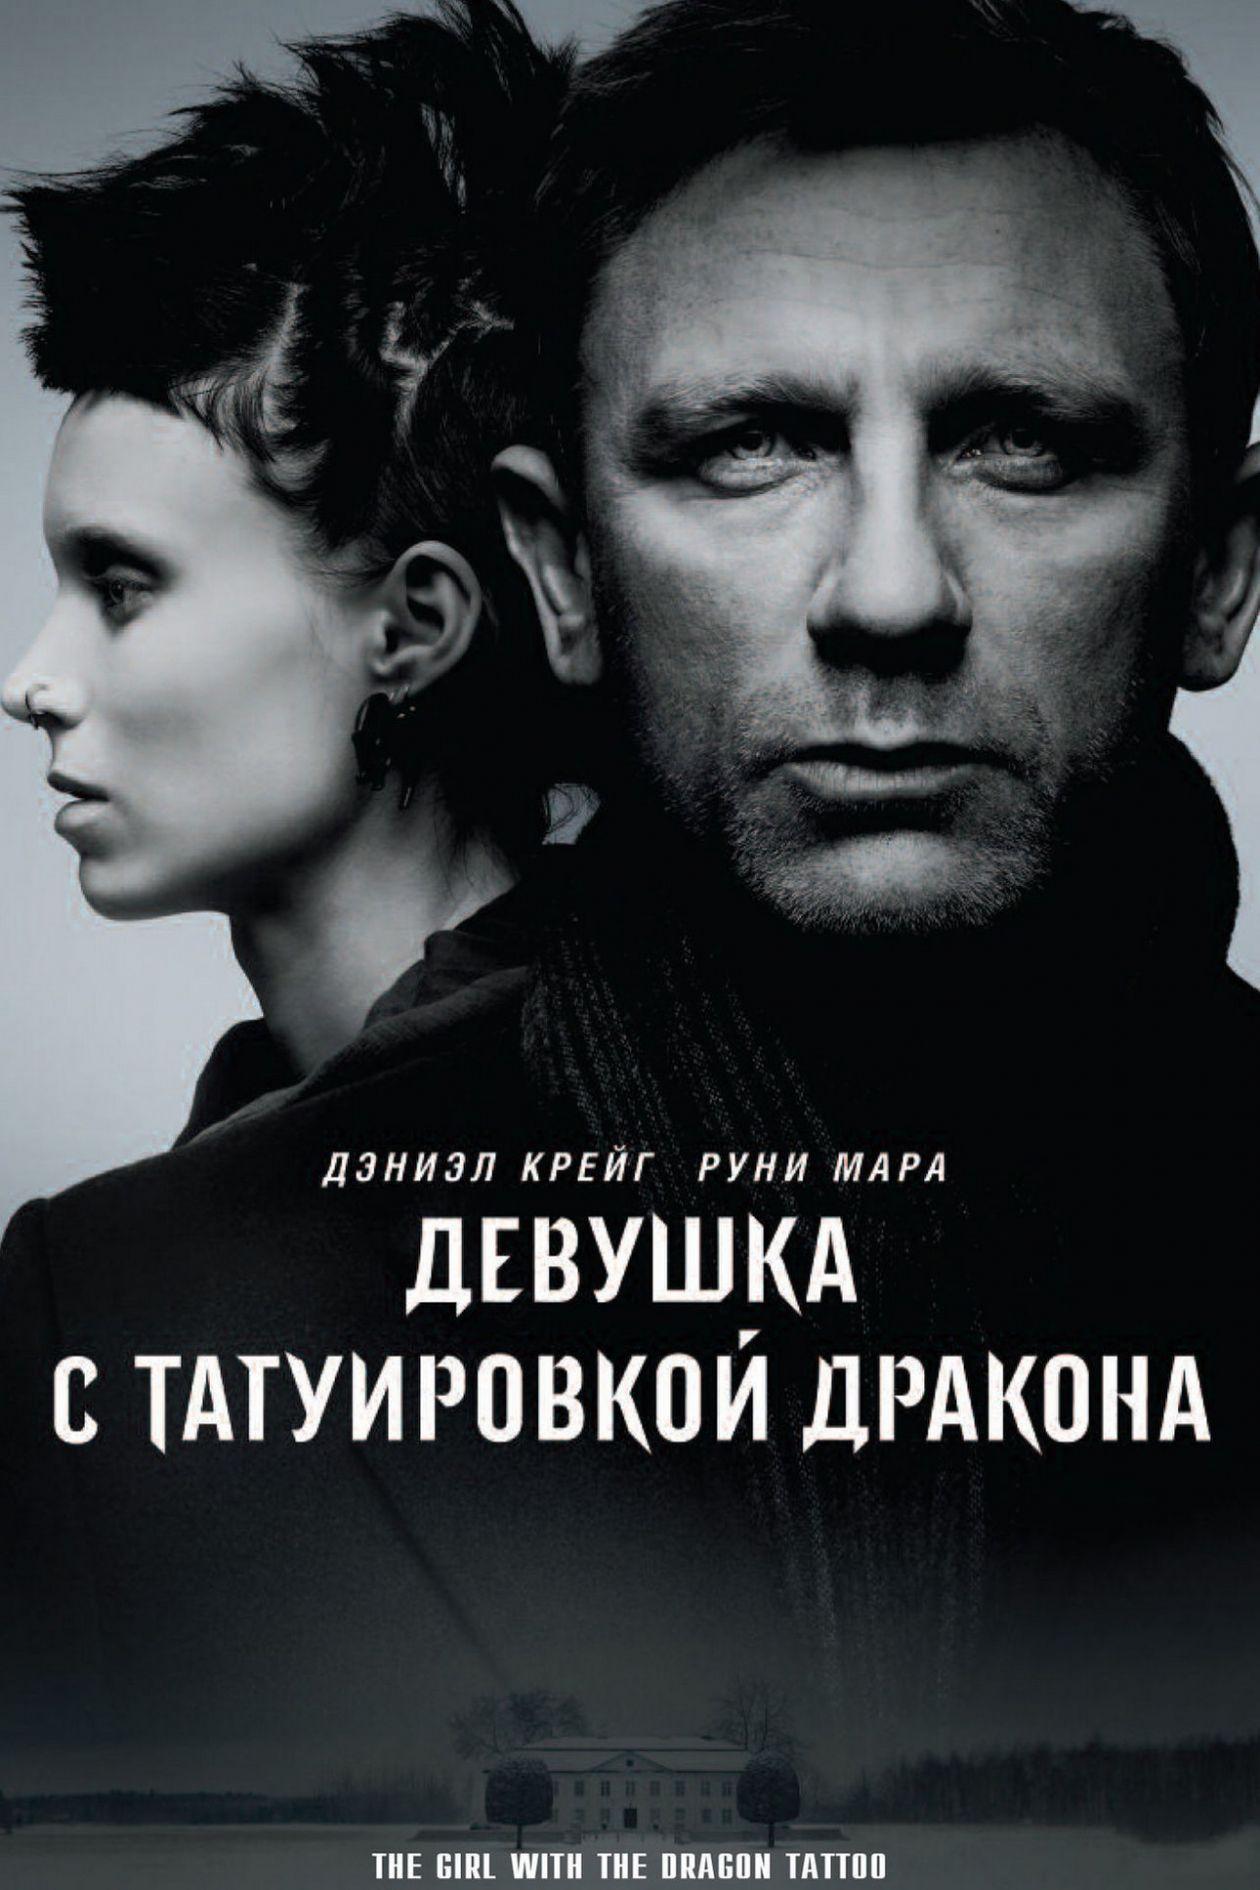 Rooney Mara : Lisbeth Salander  The Girl with the Dragon Tattoo / Millénium : Les Hommes qui n'aimaient pas les femmes  David Fincher 2011